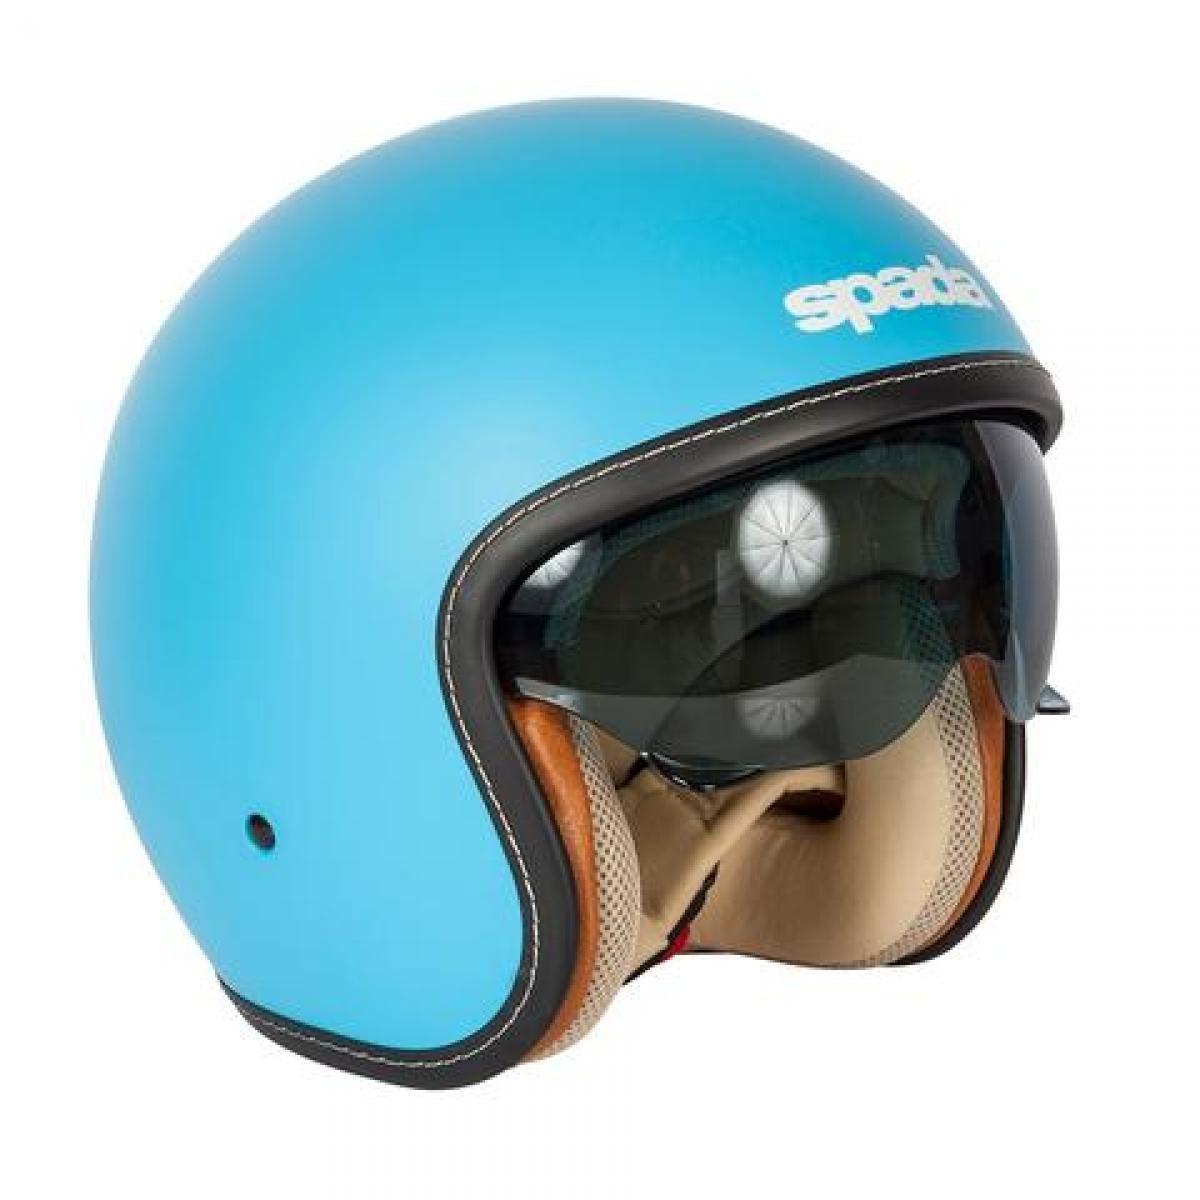 Spada-Raze-Ouvert-Casque-Bleu-Integre-Visiere miniature 8